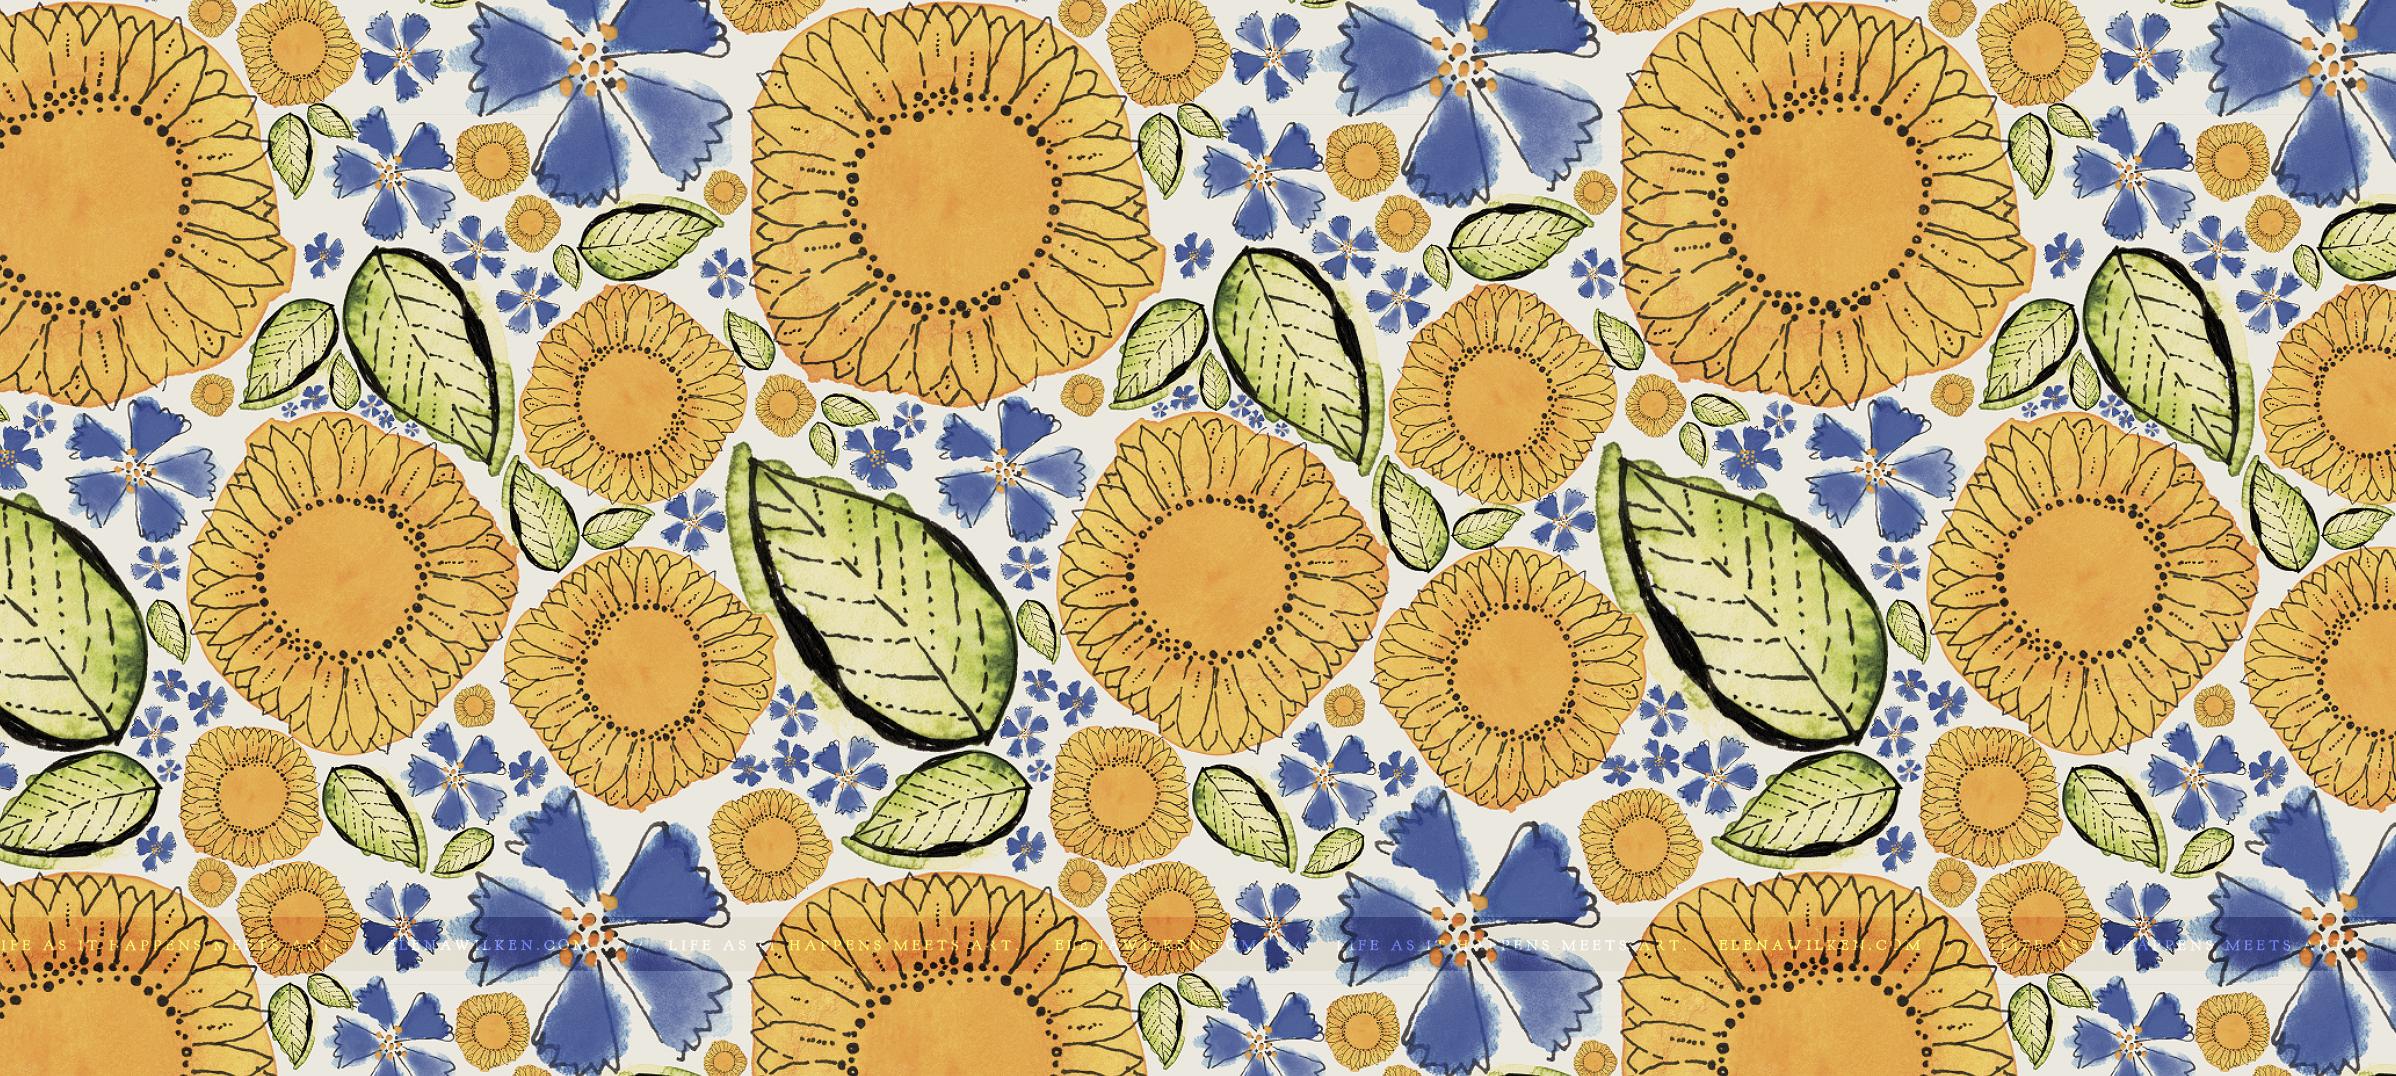 elena-wilken-whimsical-watercolor-fields-surface-pattern-design9.png